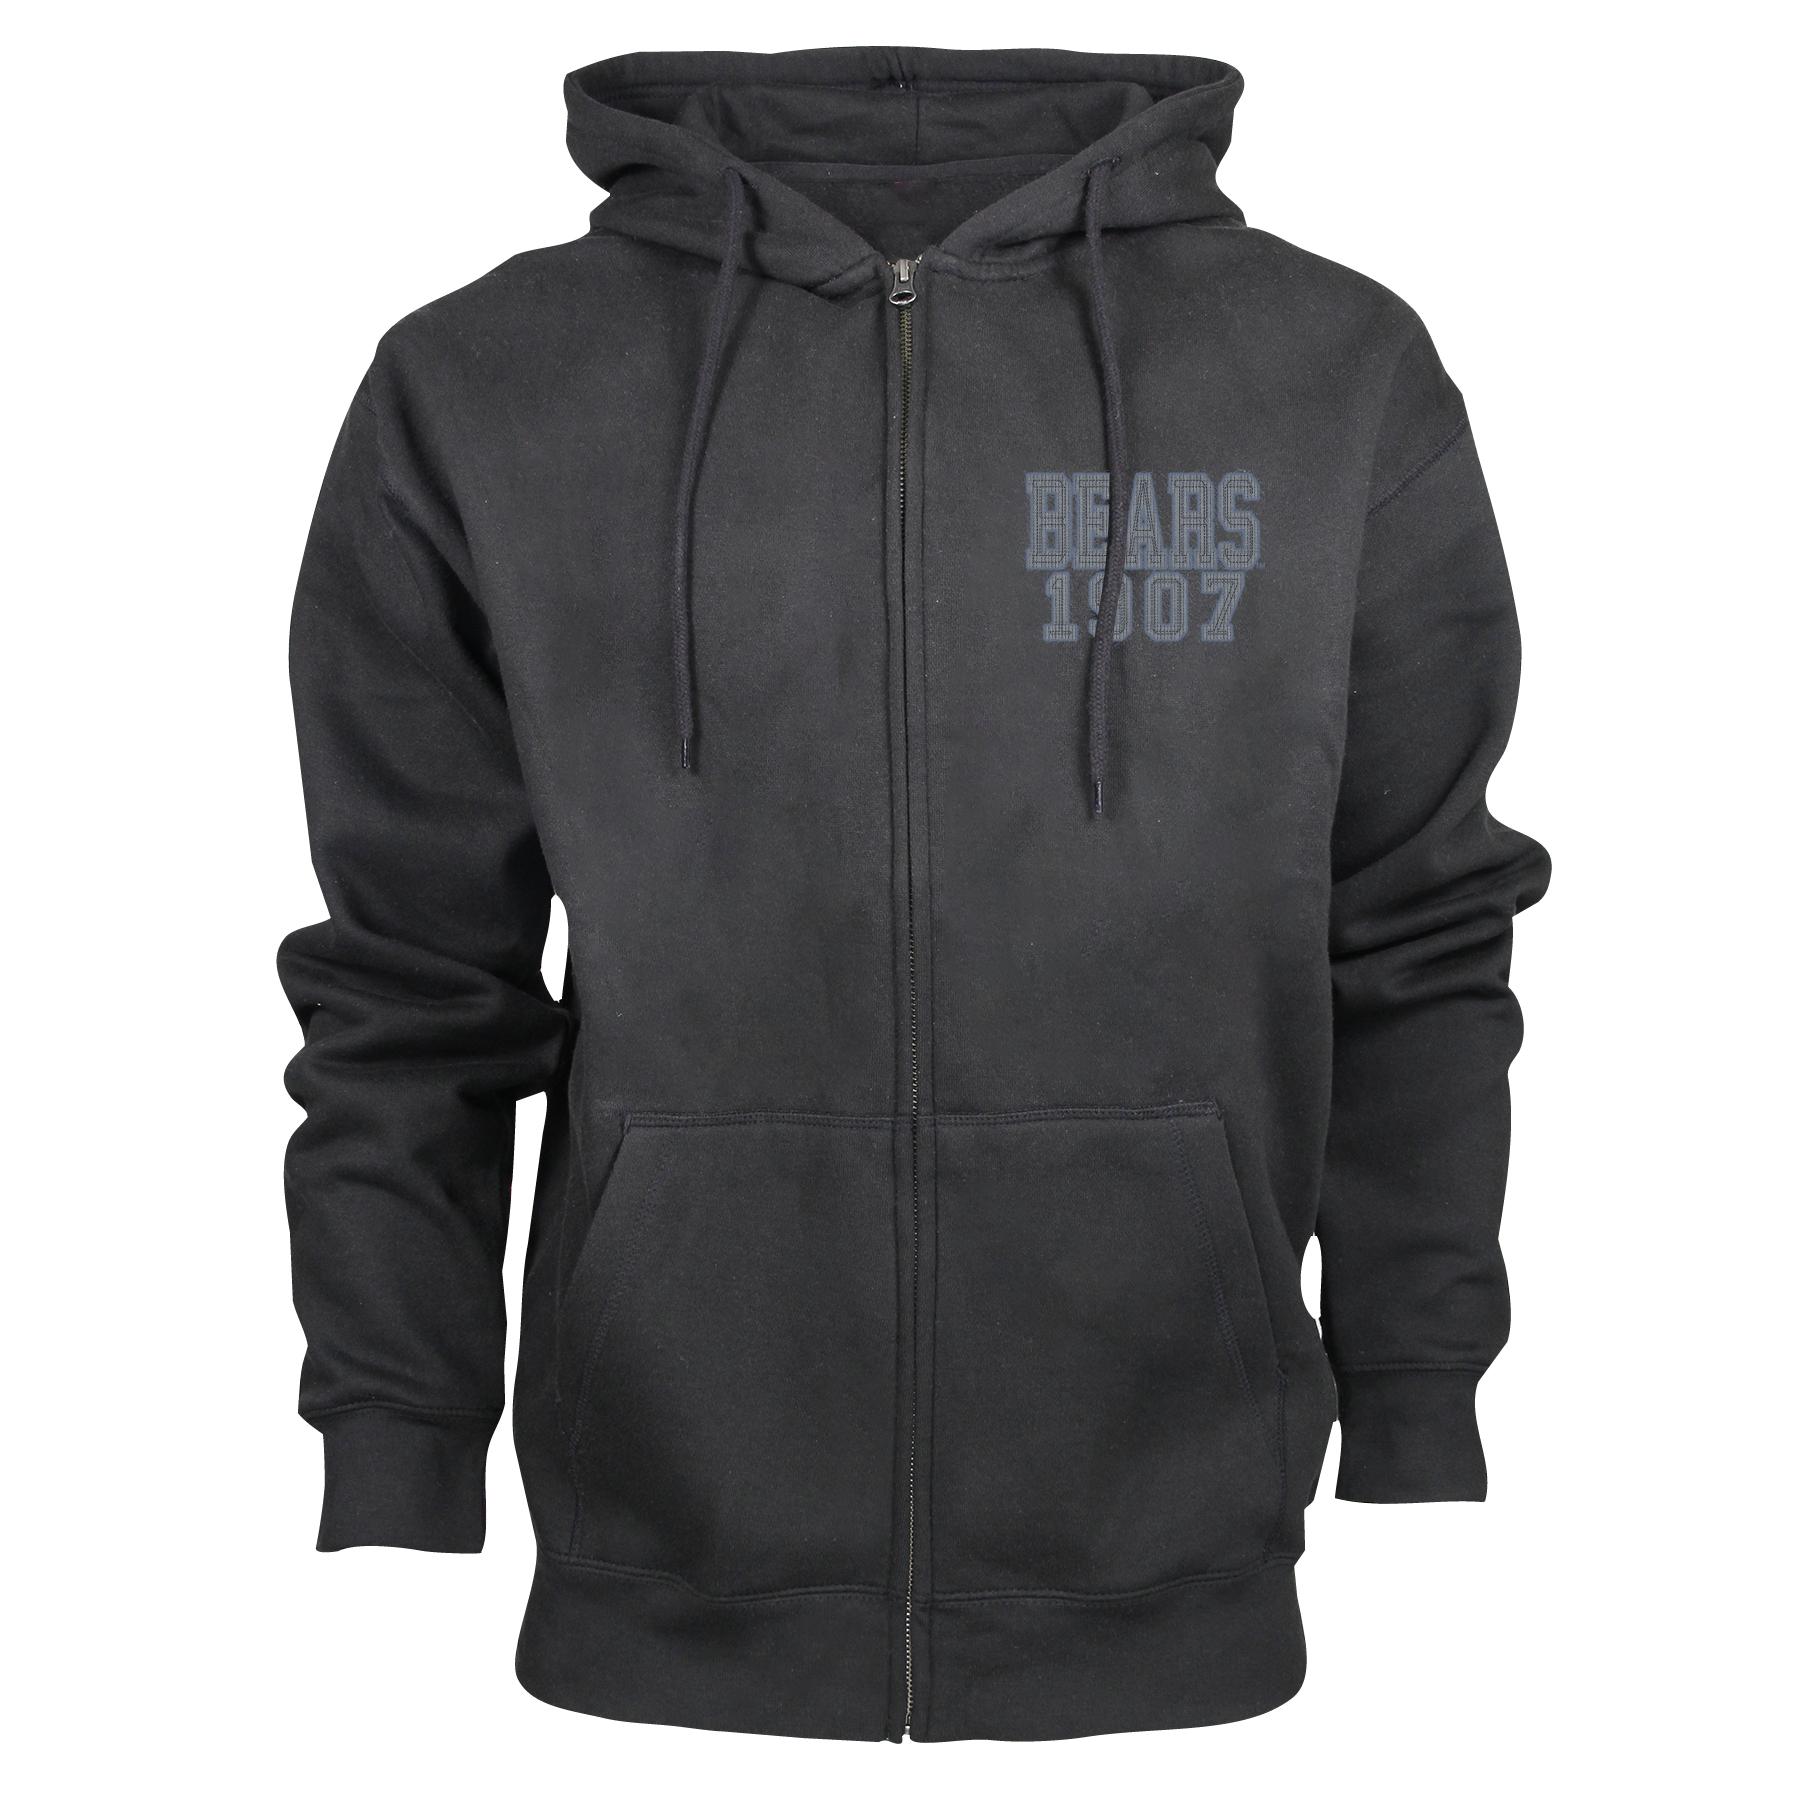 Bears Full Zip Jacket